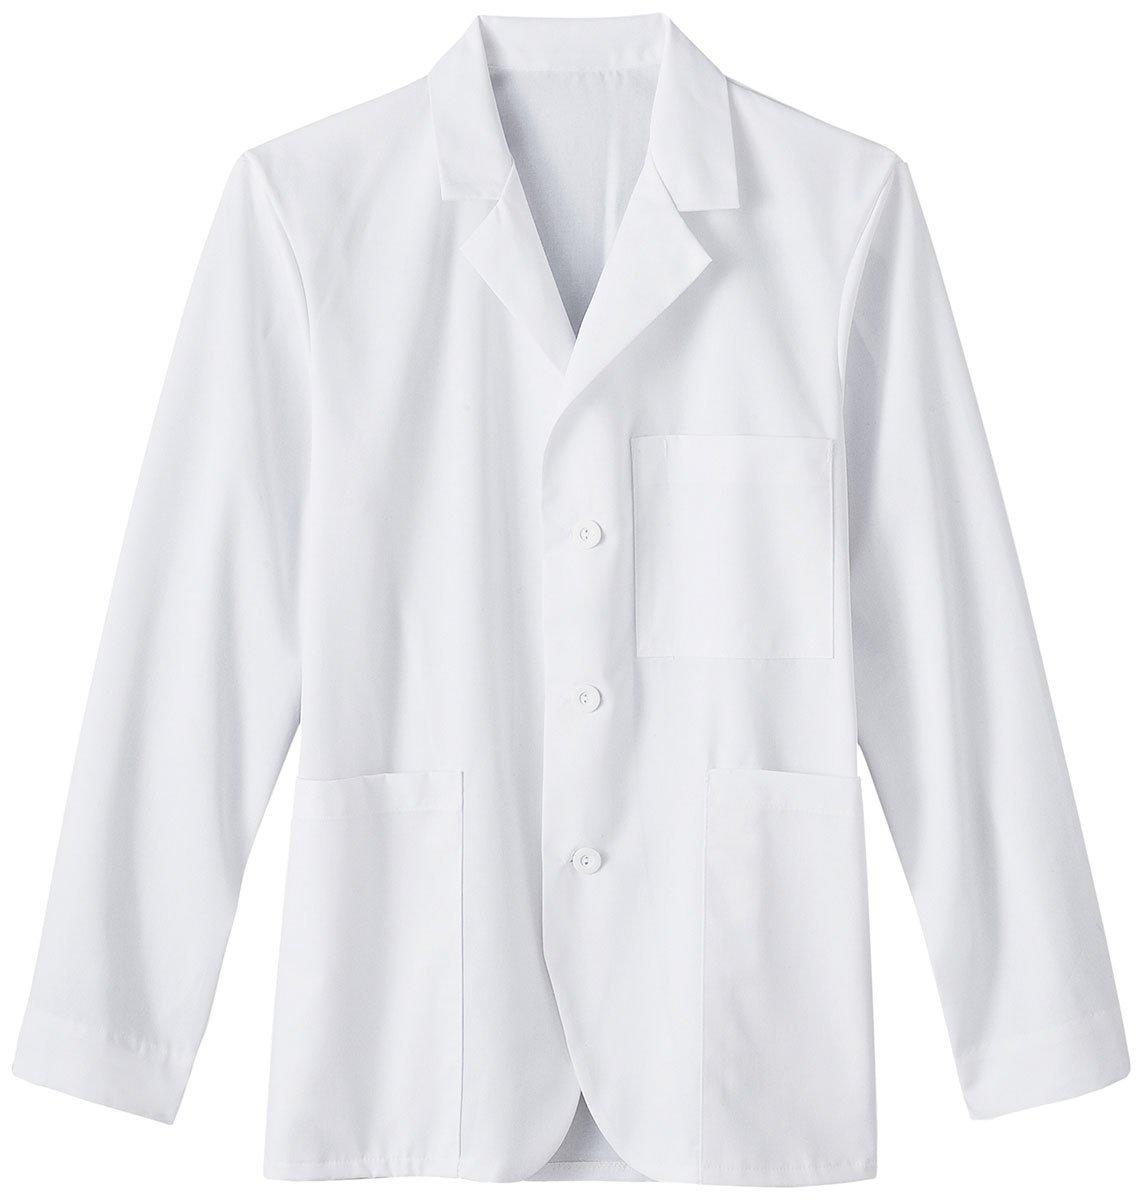 Meta Labwear Unisex 7-Pocket 30''; Lab Coat Small White